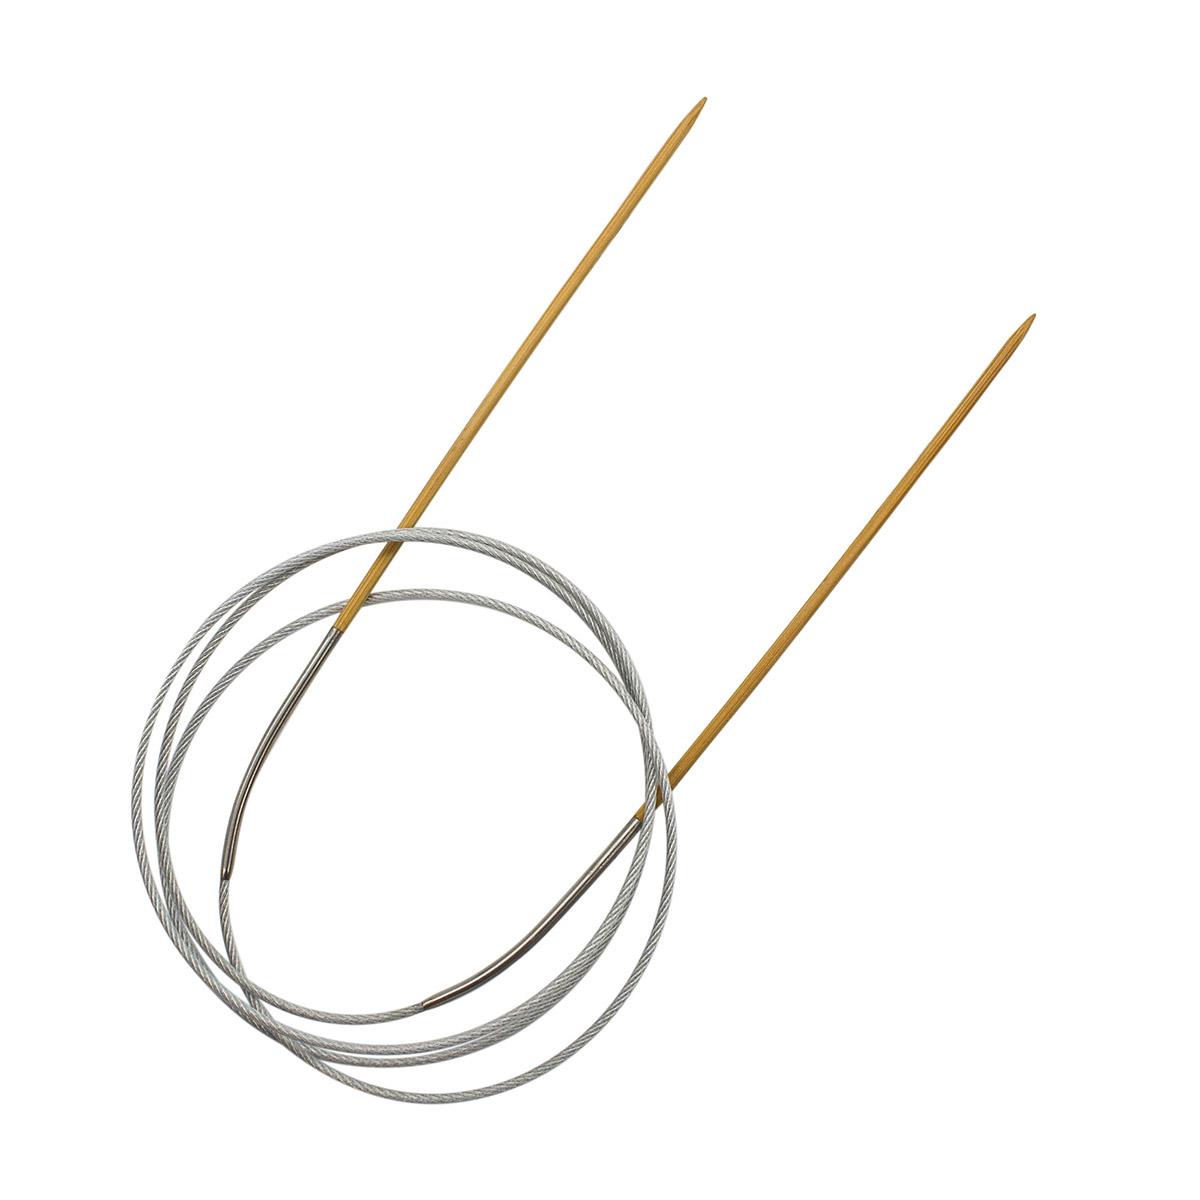 942720 Спицы круговые бамбук с метал.тросиком 100см, 2,0мм Hobby&Pro